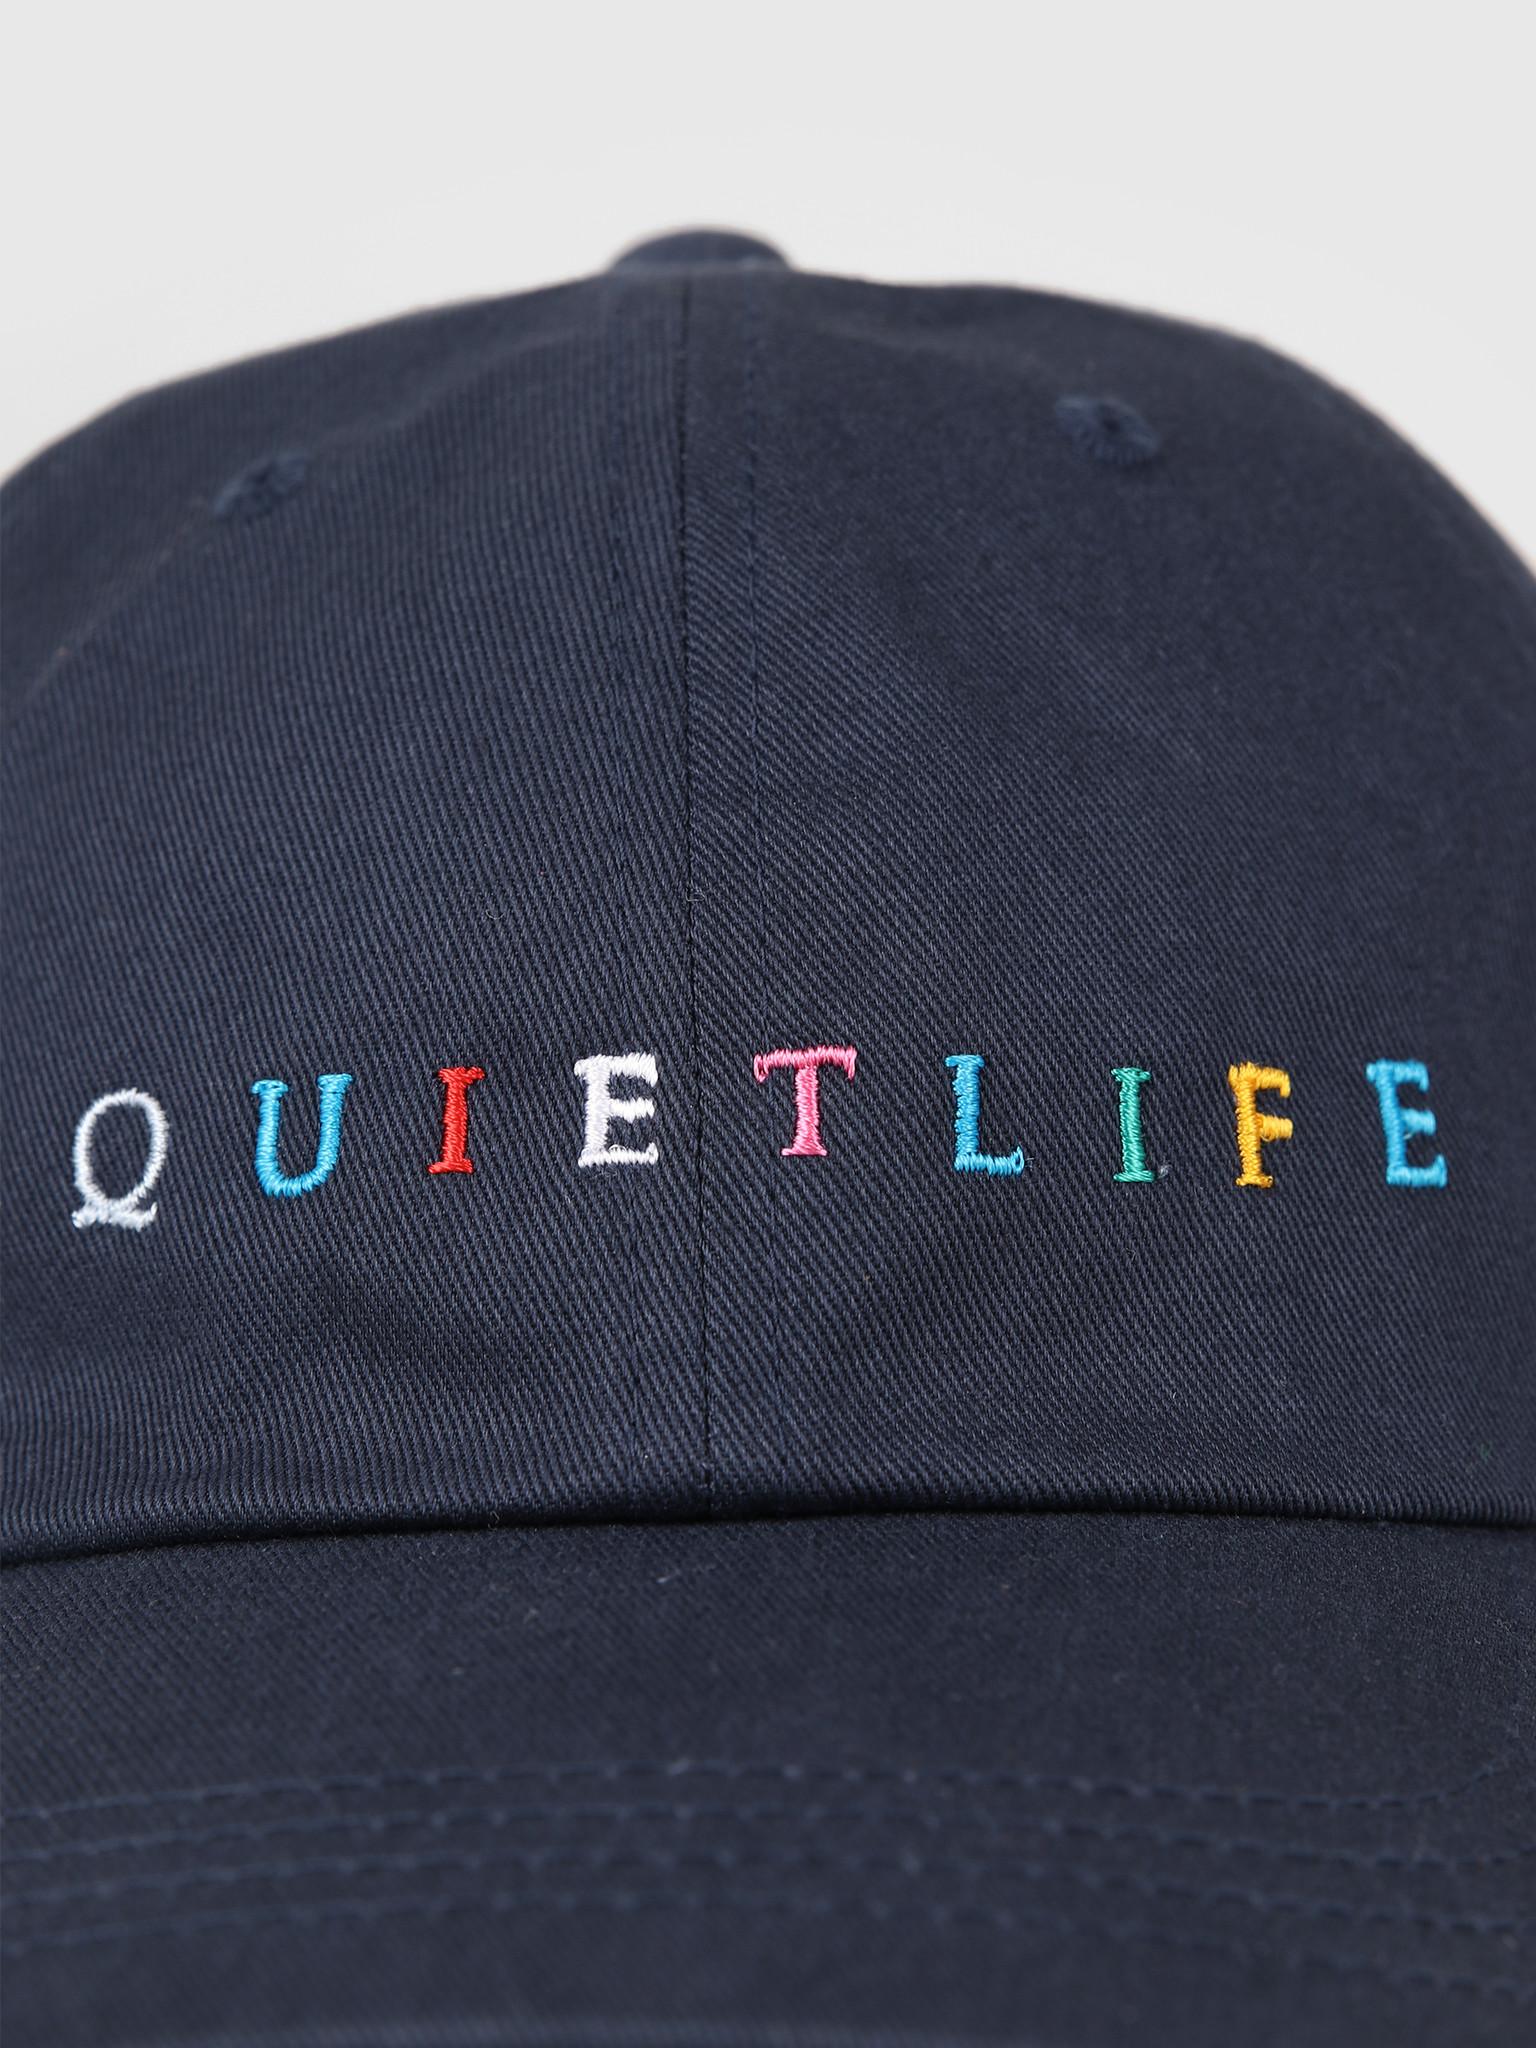 The Quiet Life The Quiet Life Rainbow Dad Hat Navy 19SPD2-2201-NAV-OS